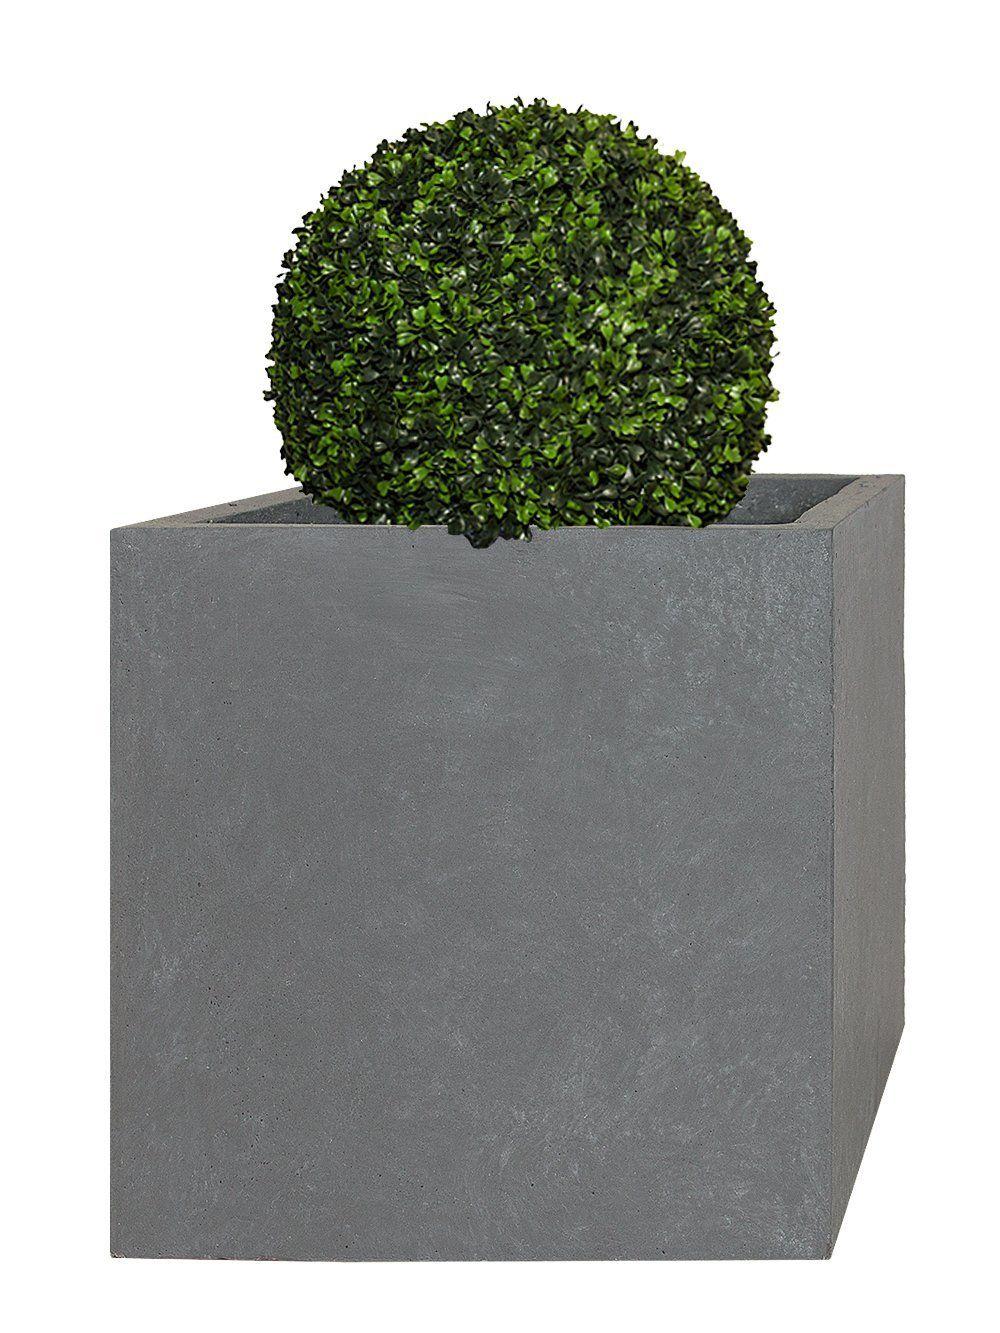 Pflanzwerk Pflanzkubel Cube Grau 38x44x44cm Frostbestandig Uv